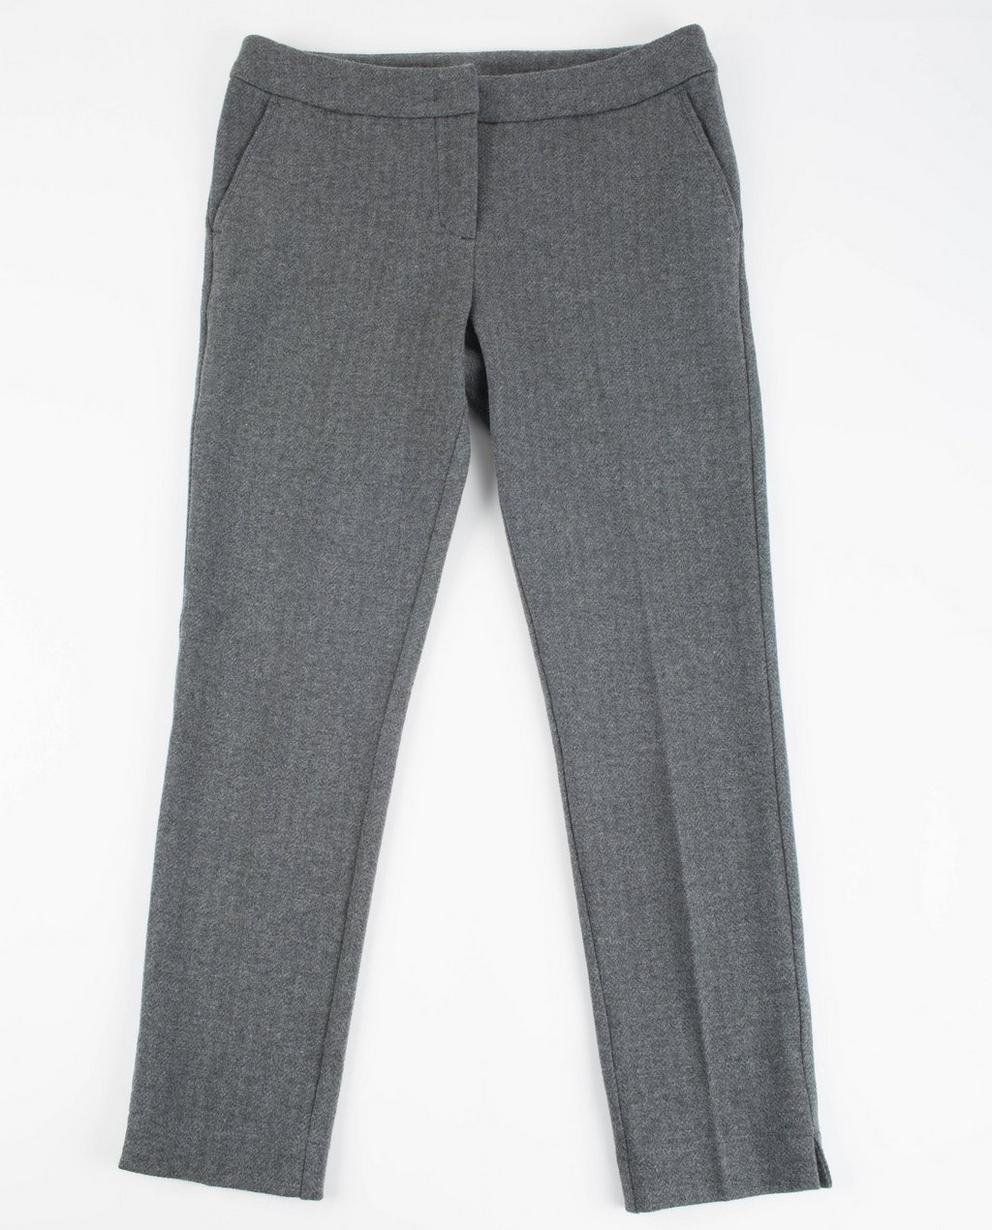 Grijze klassieke pantalon - met subtiel visgraatmotief - JBC